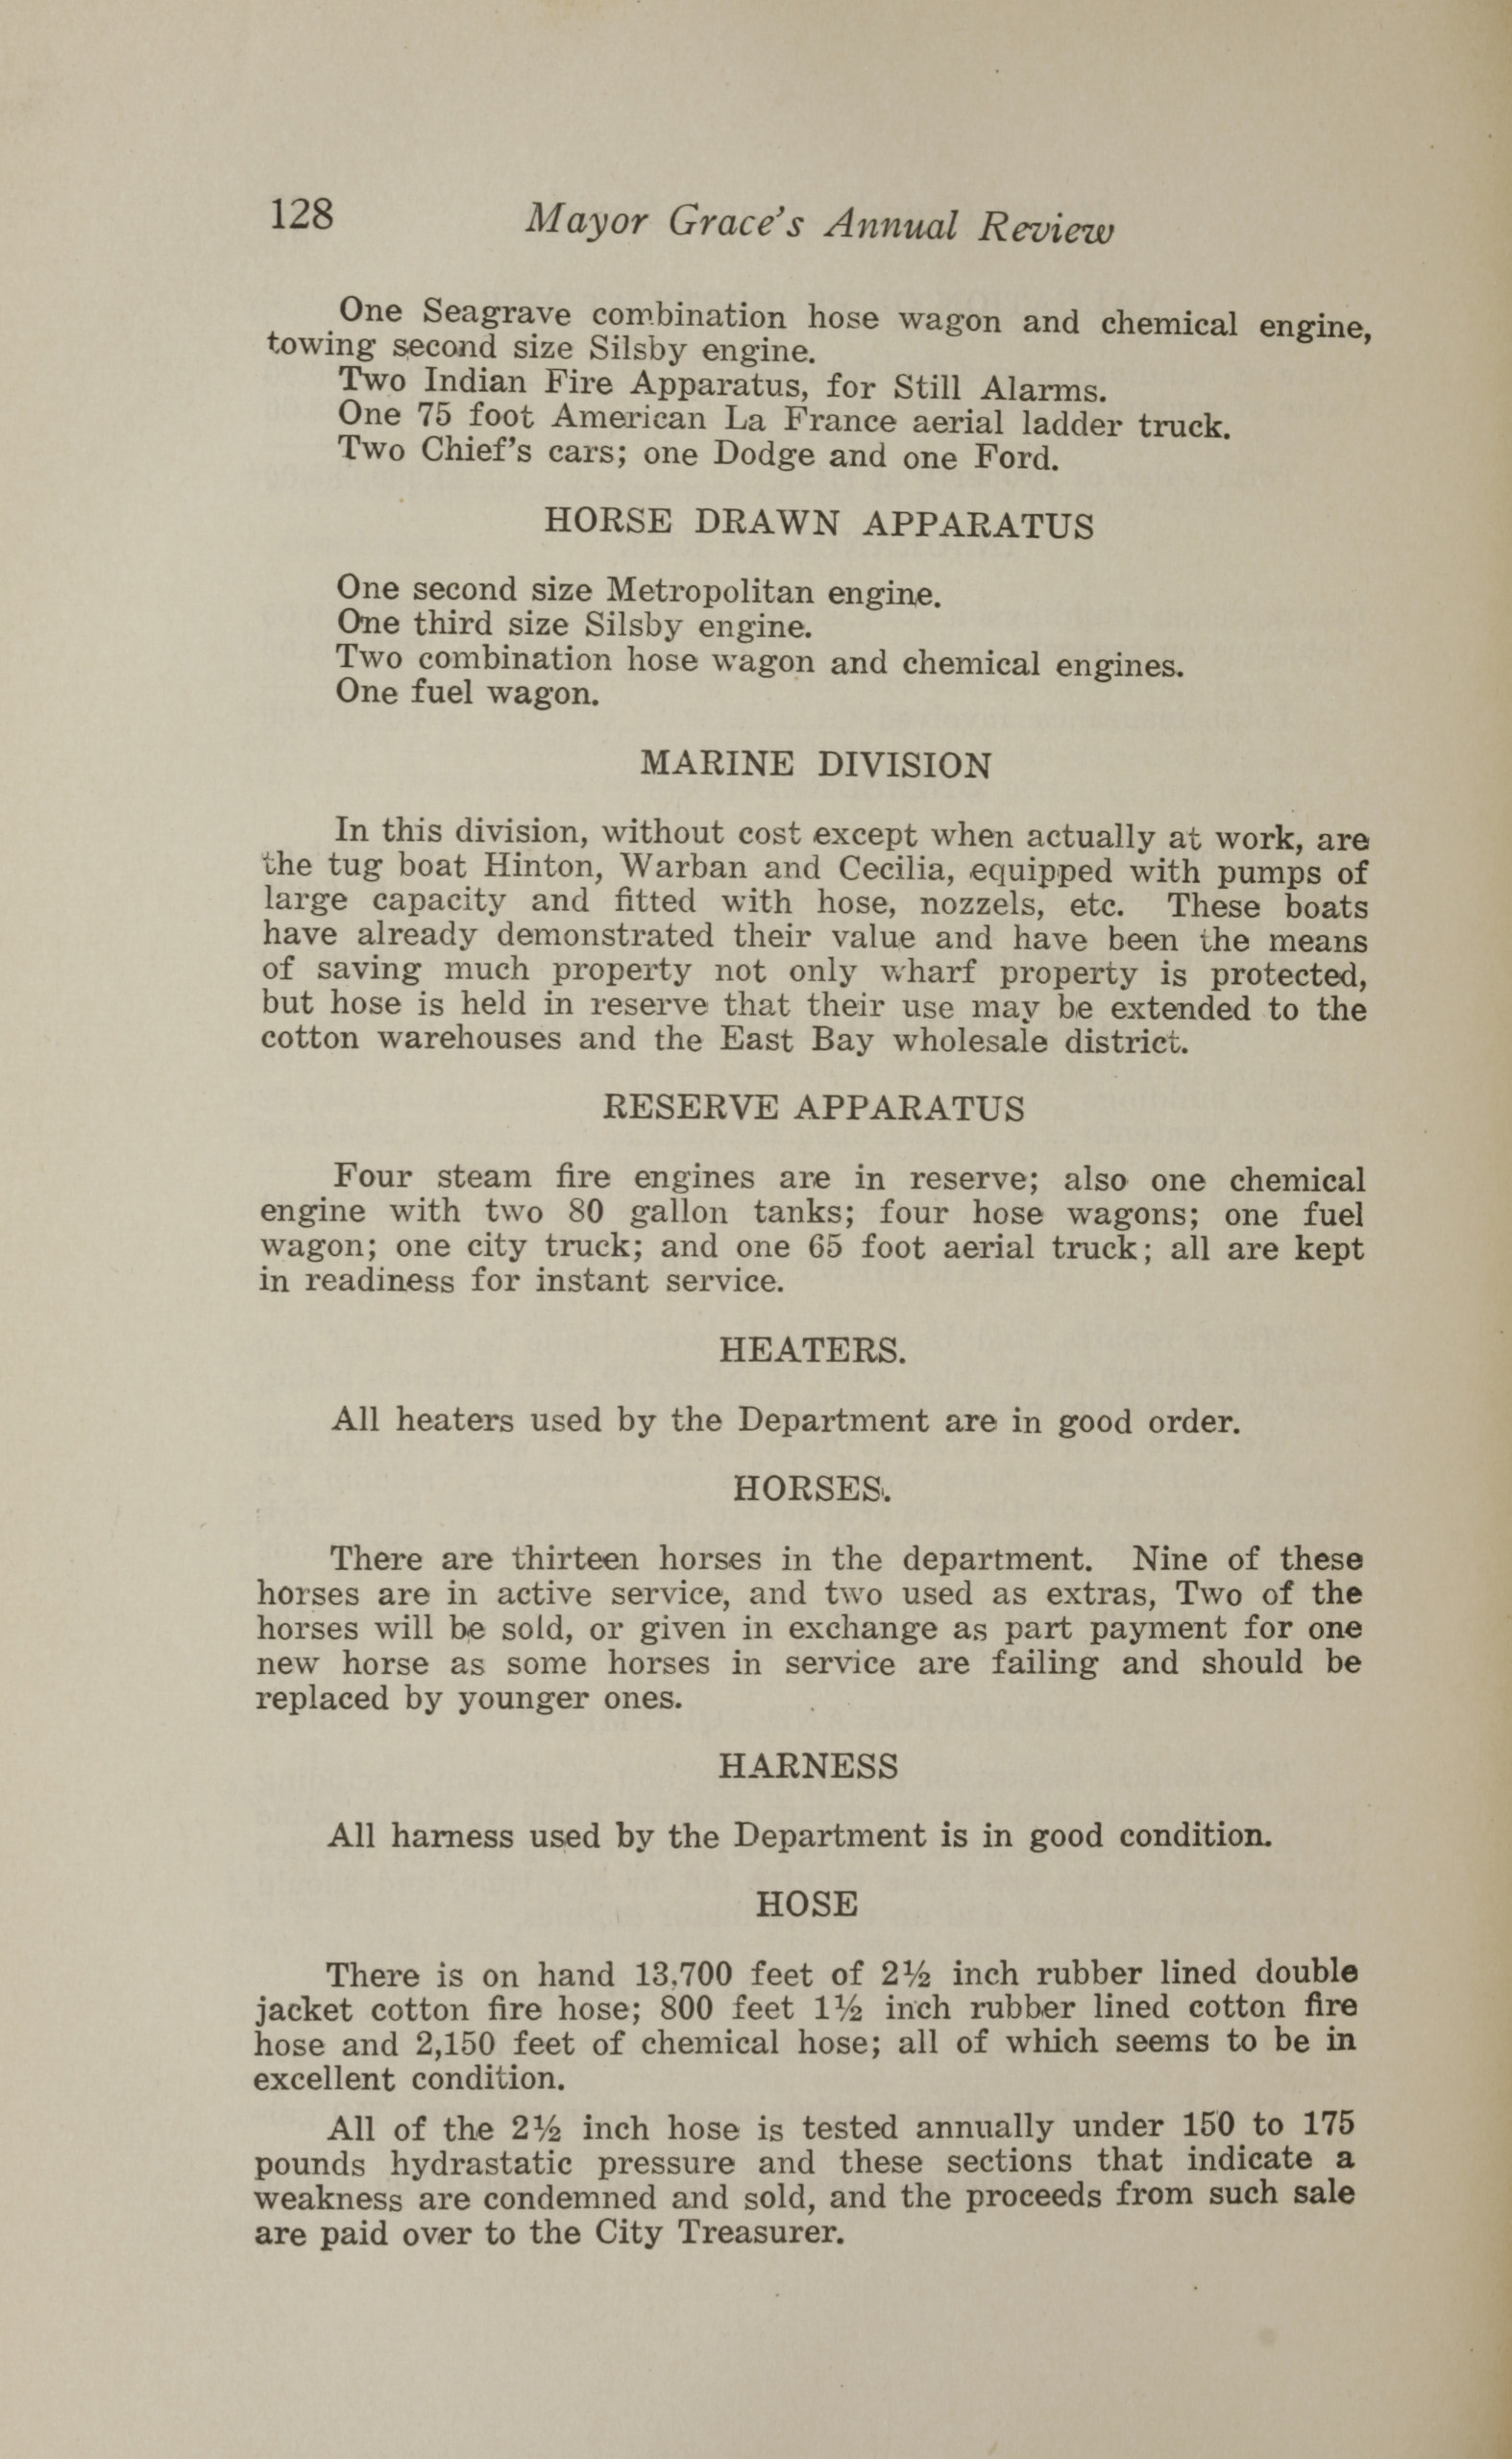 Charleston Yearbook, 1923, page 128